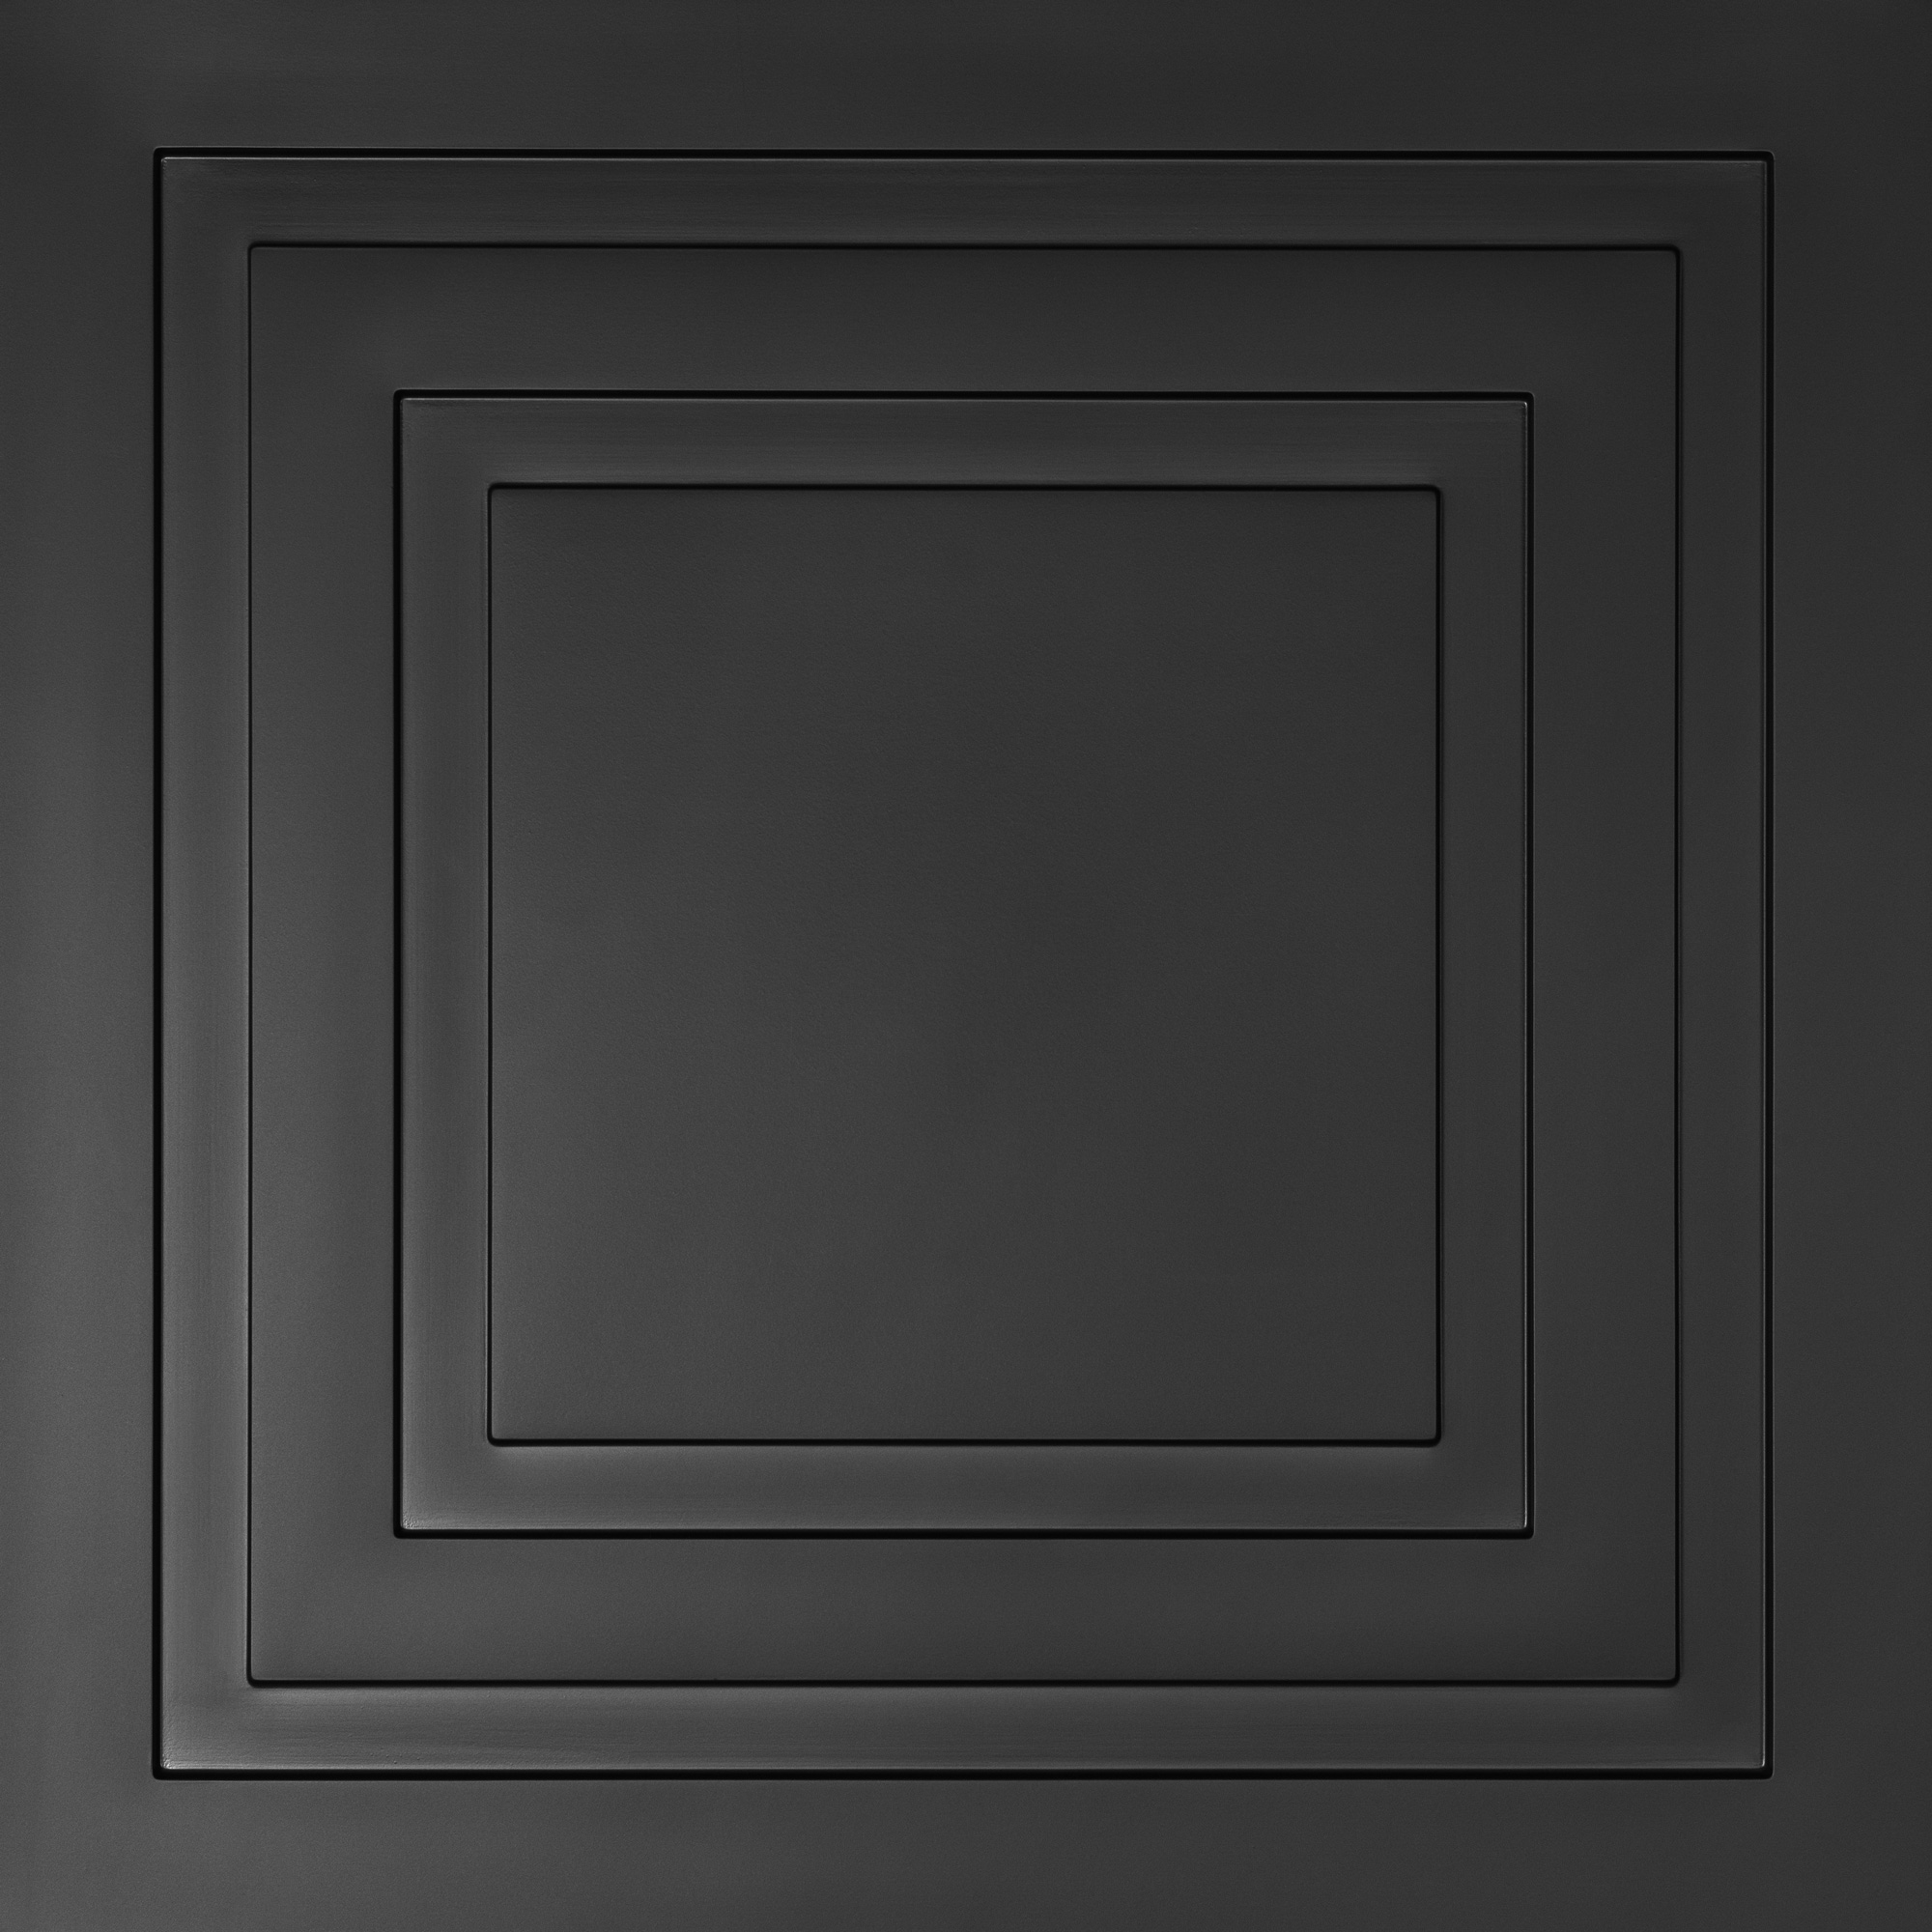 ceilume century ceiling tile 2ft x 2ft